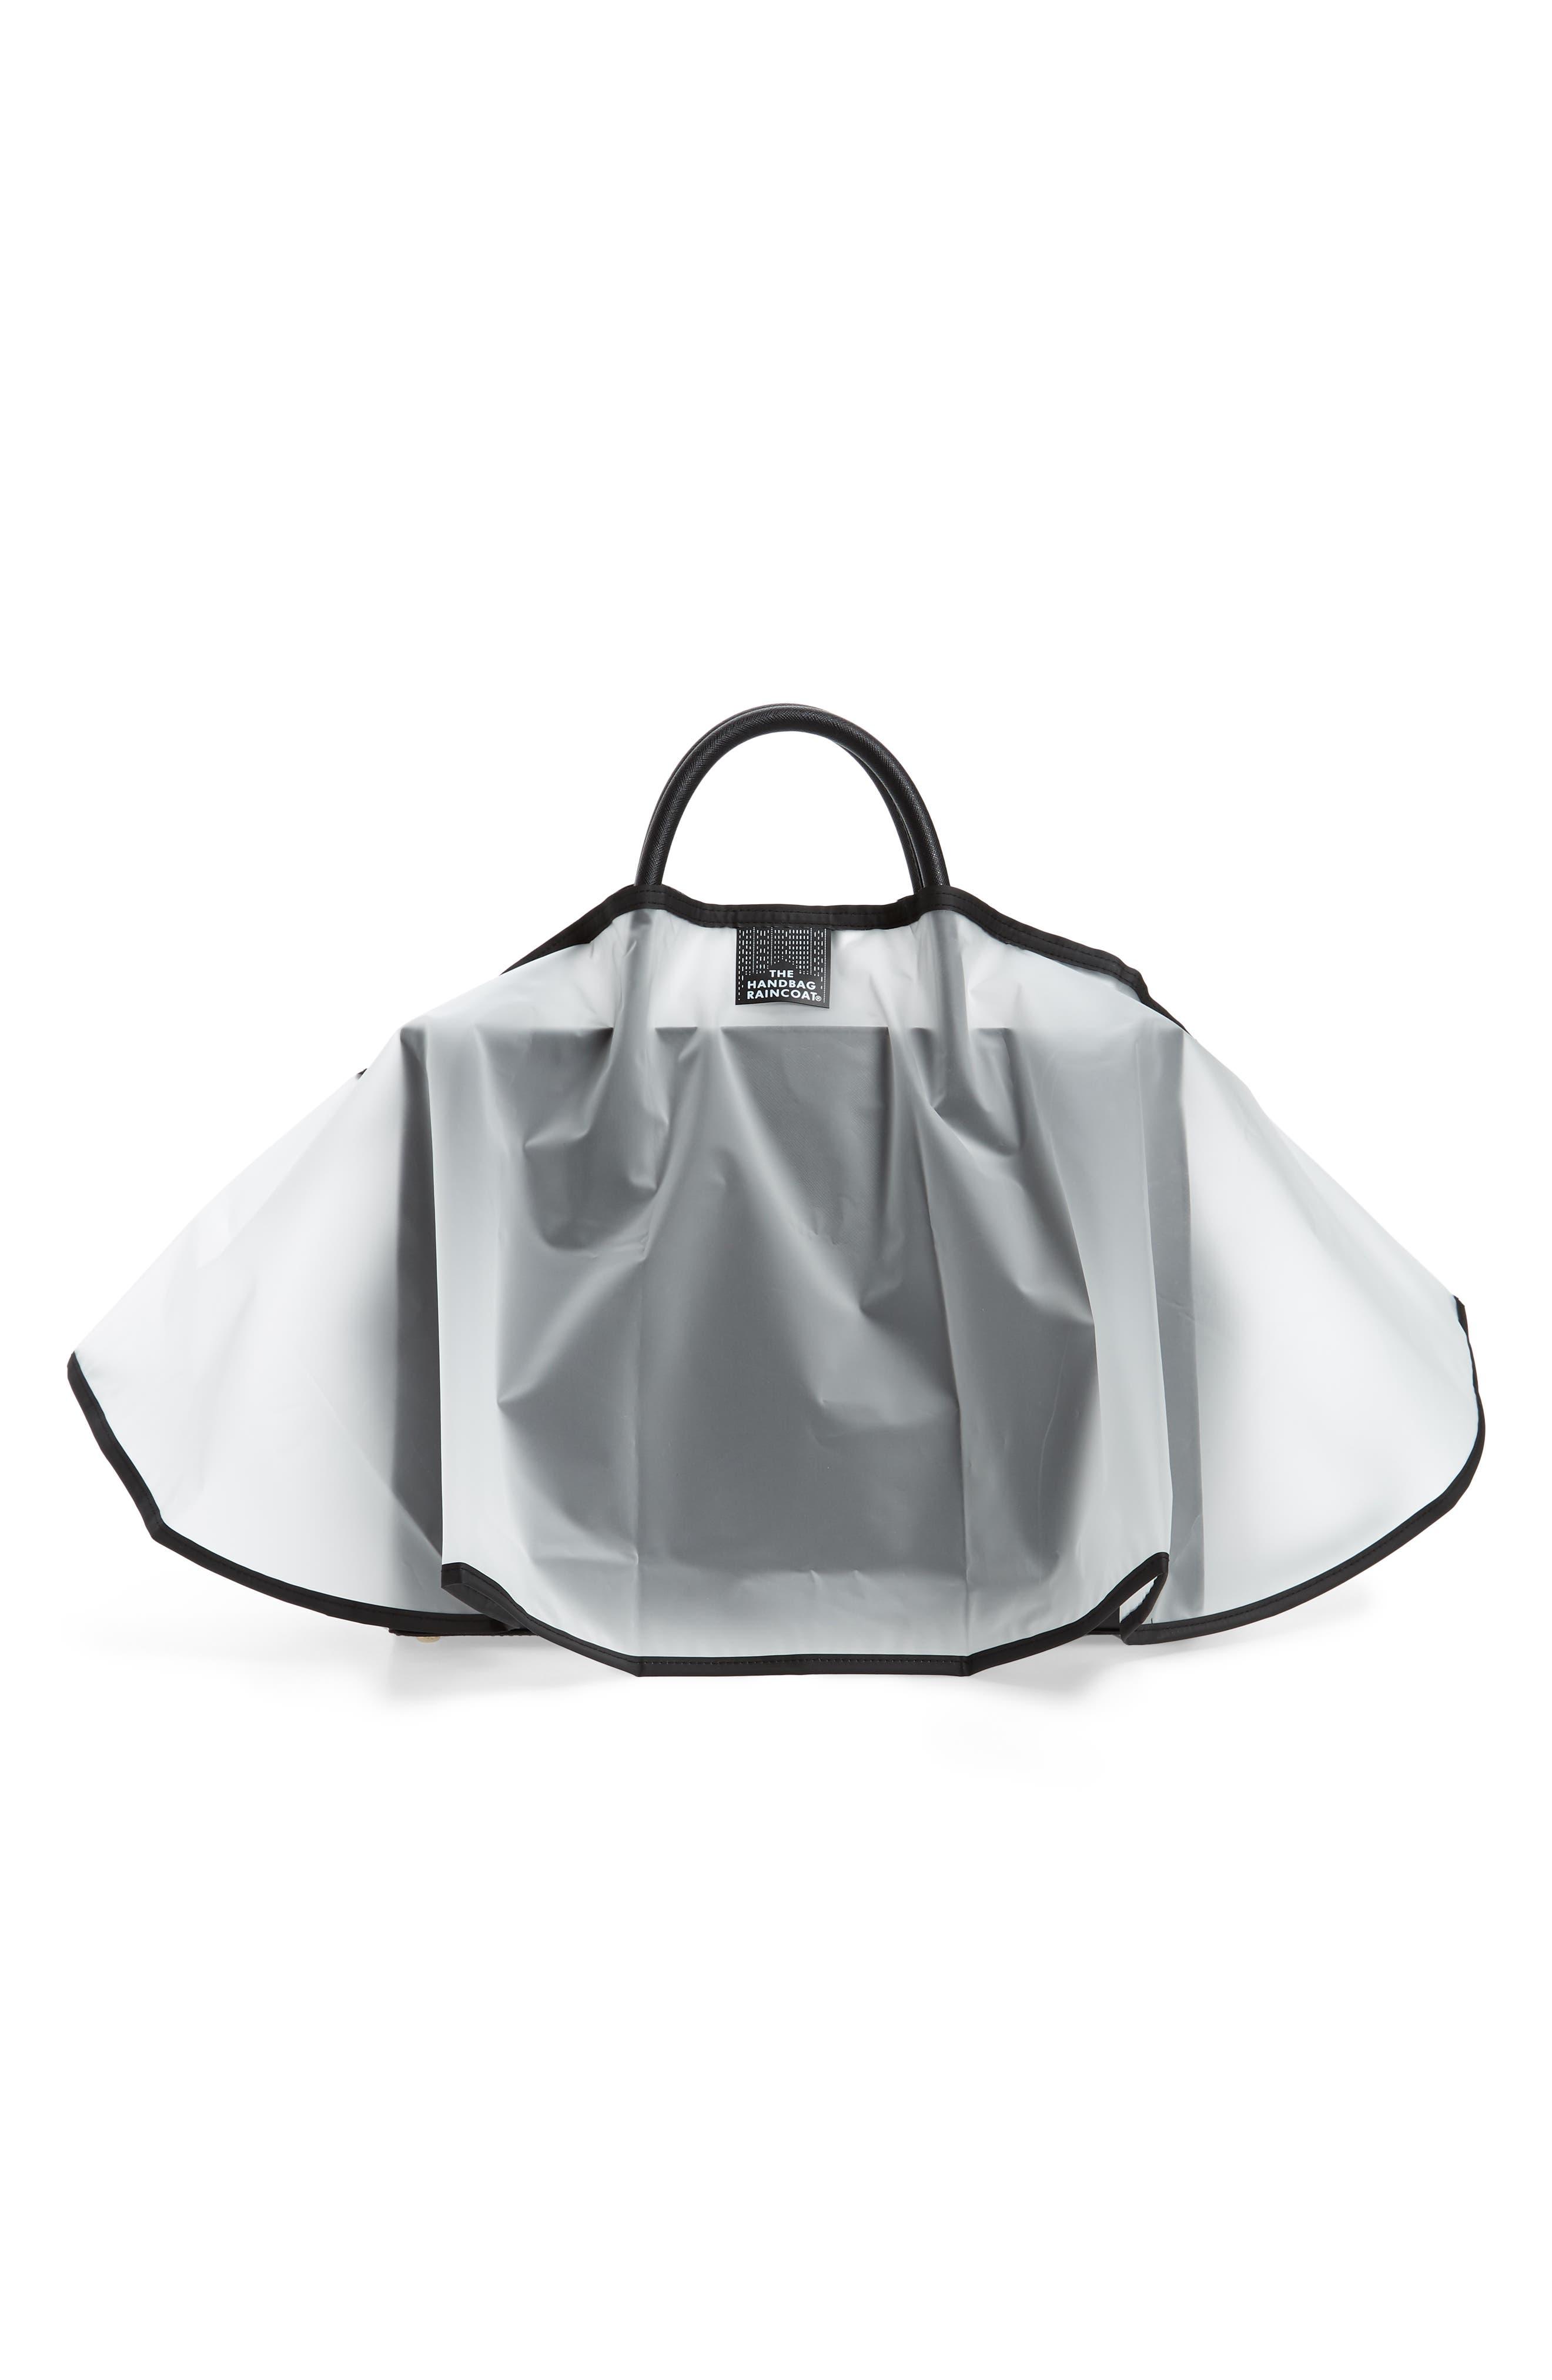 Midi Clear Handbag Protector,                             Alternate thumbnail 2, color,                             100